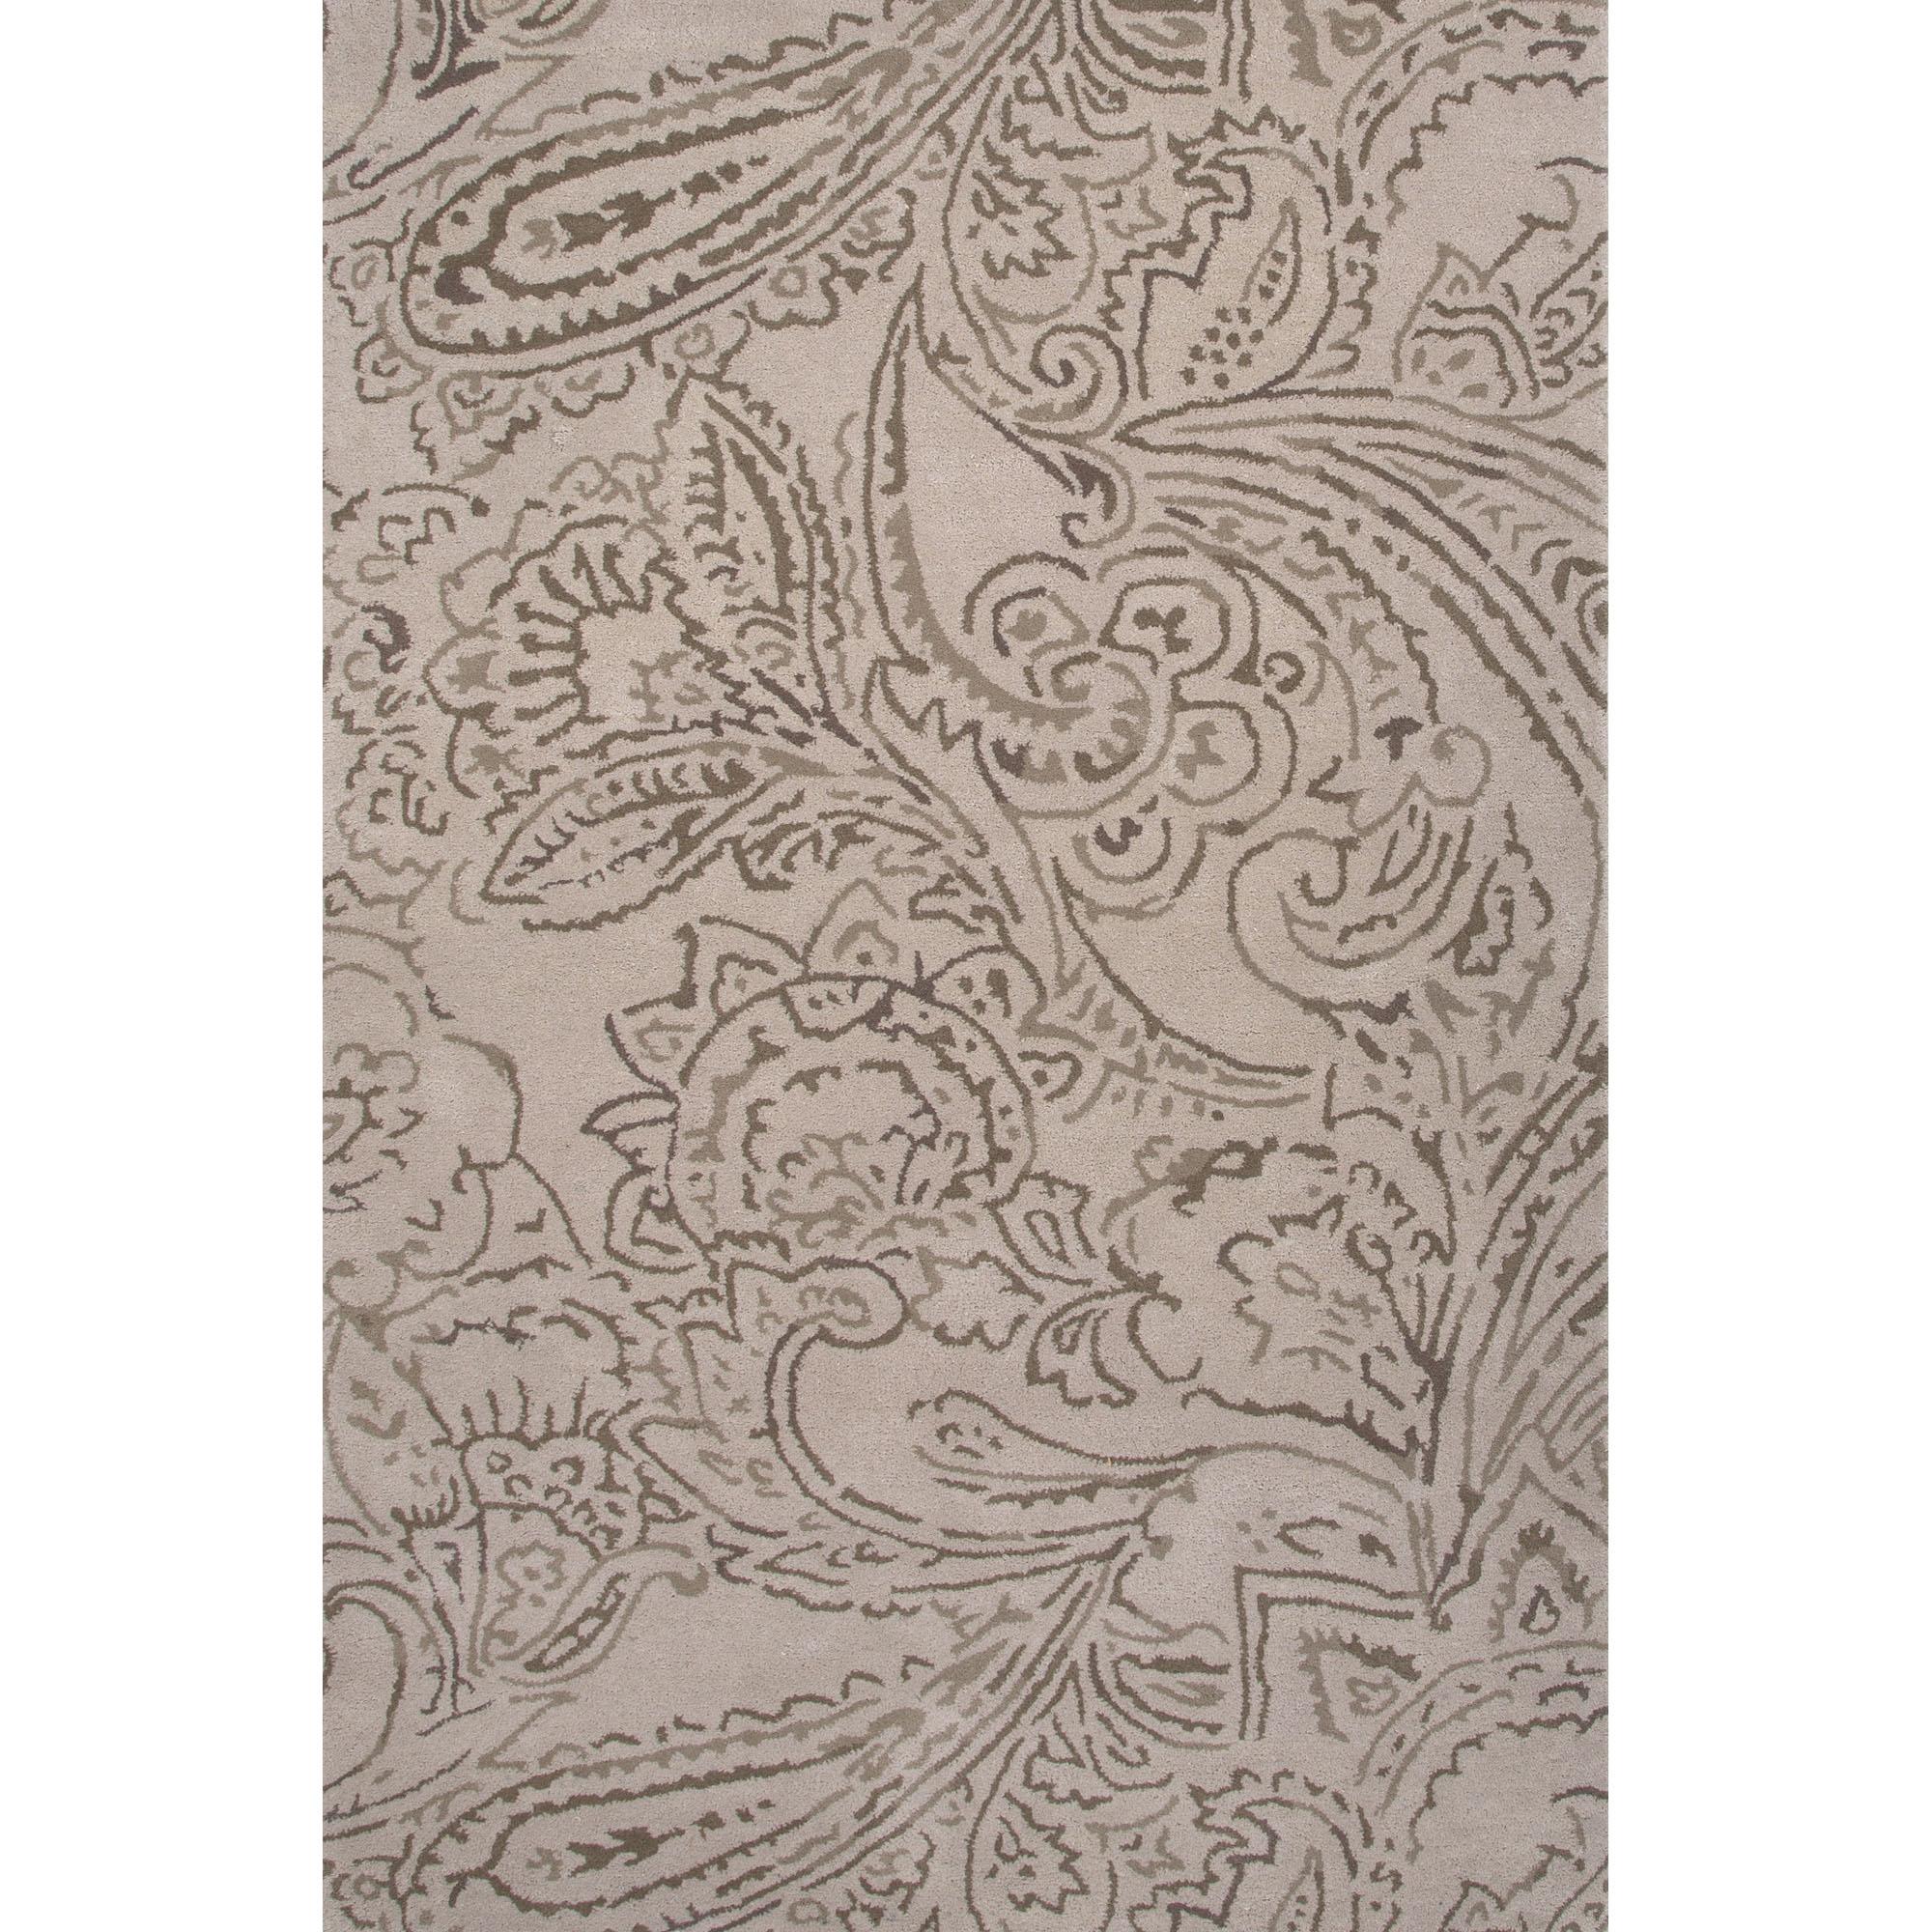 JAIPUR Rugs Timeless By Jennifer Adams Tufted 5 x 8 Rug - Item Number: RUG118496